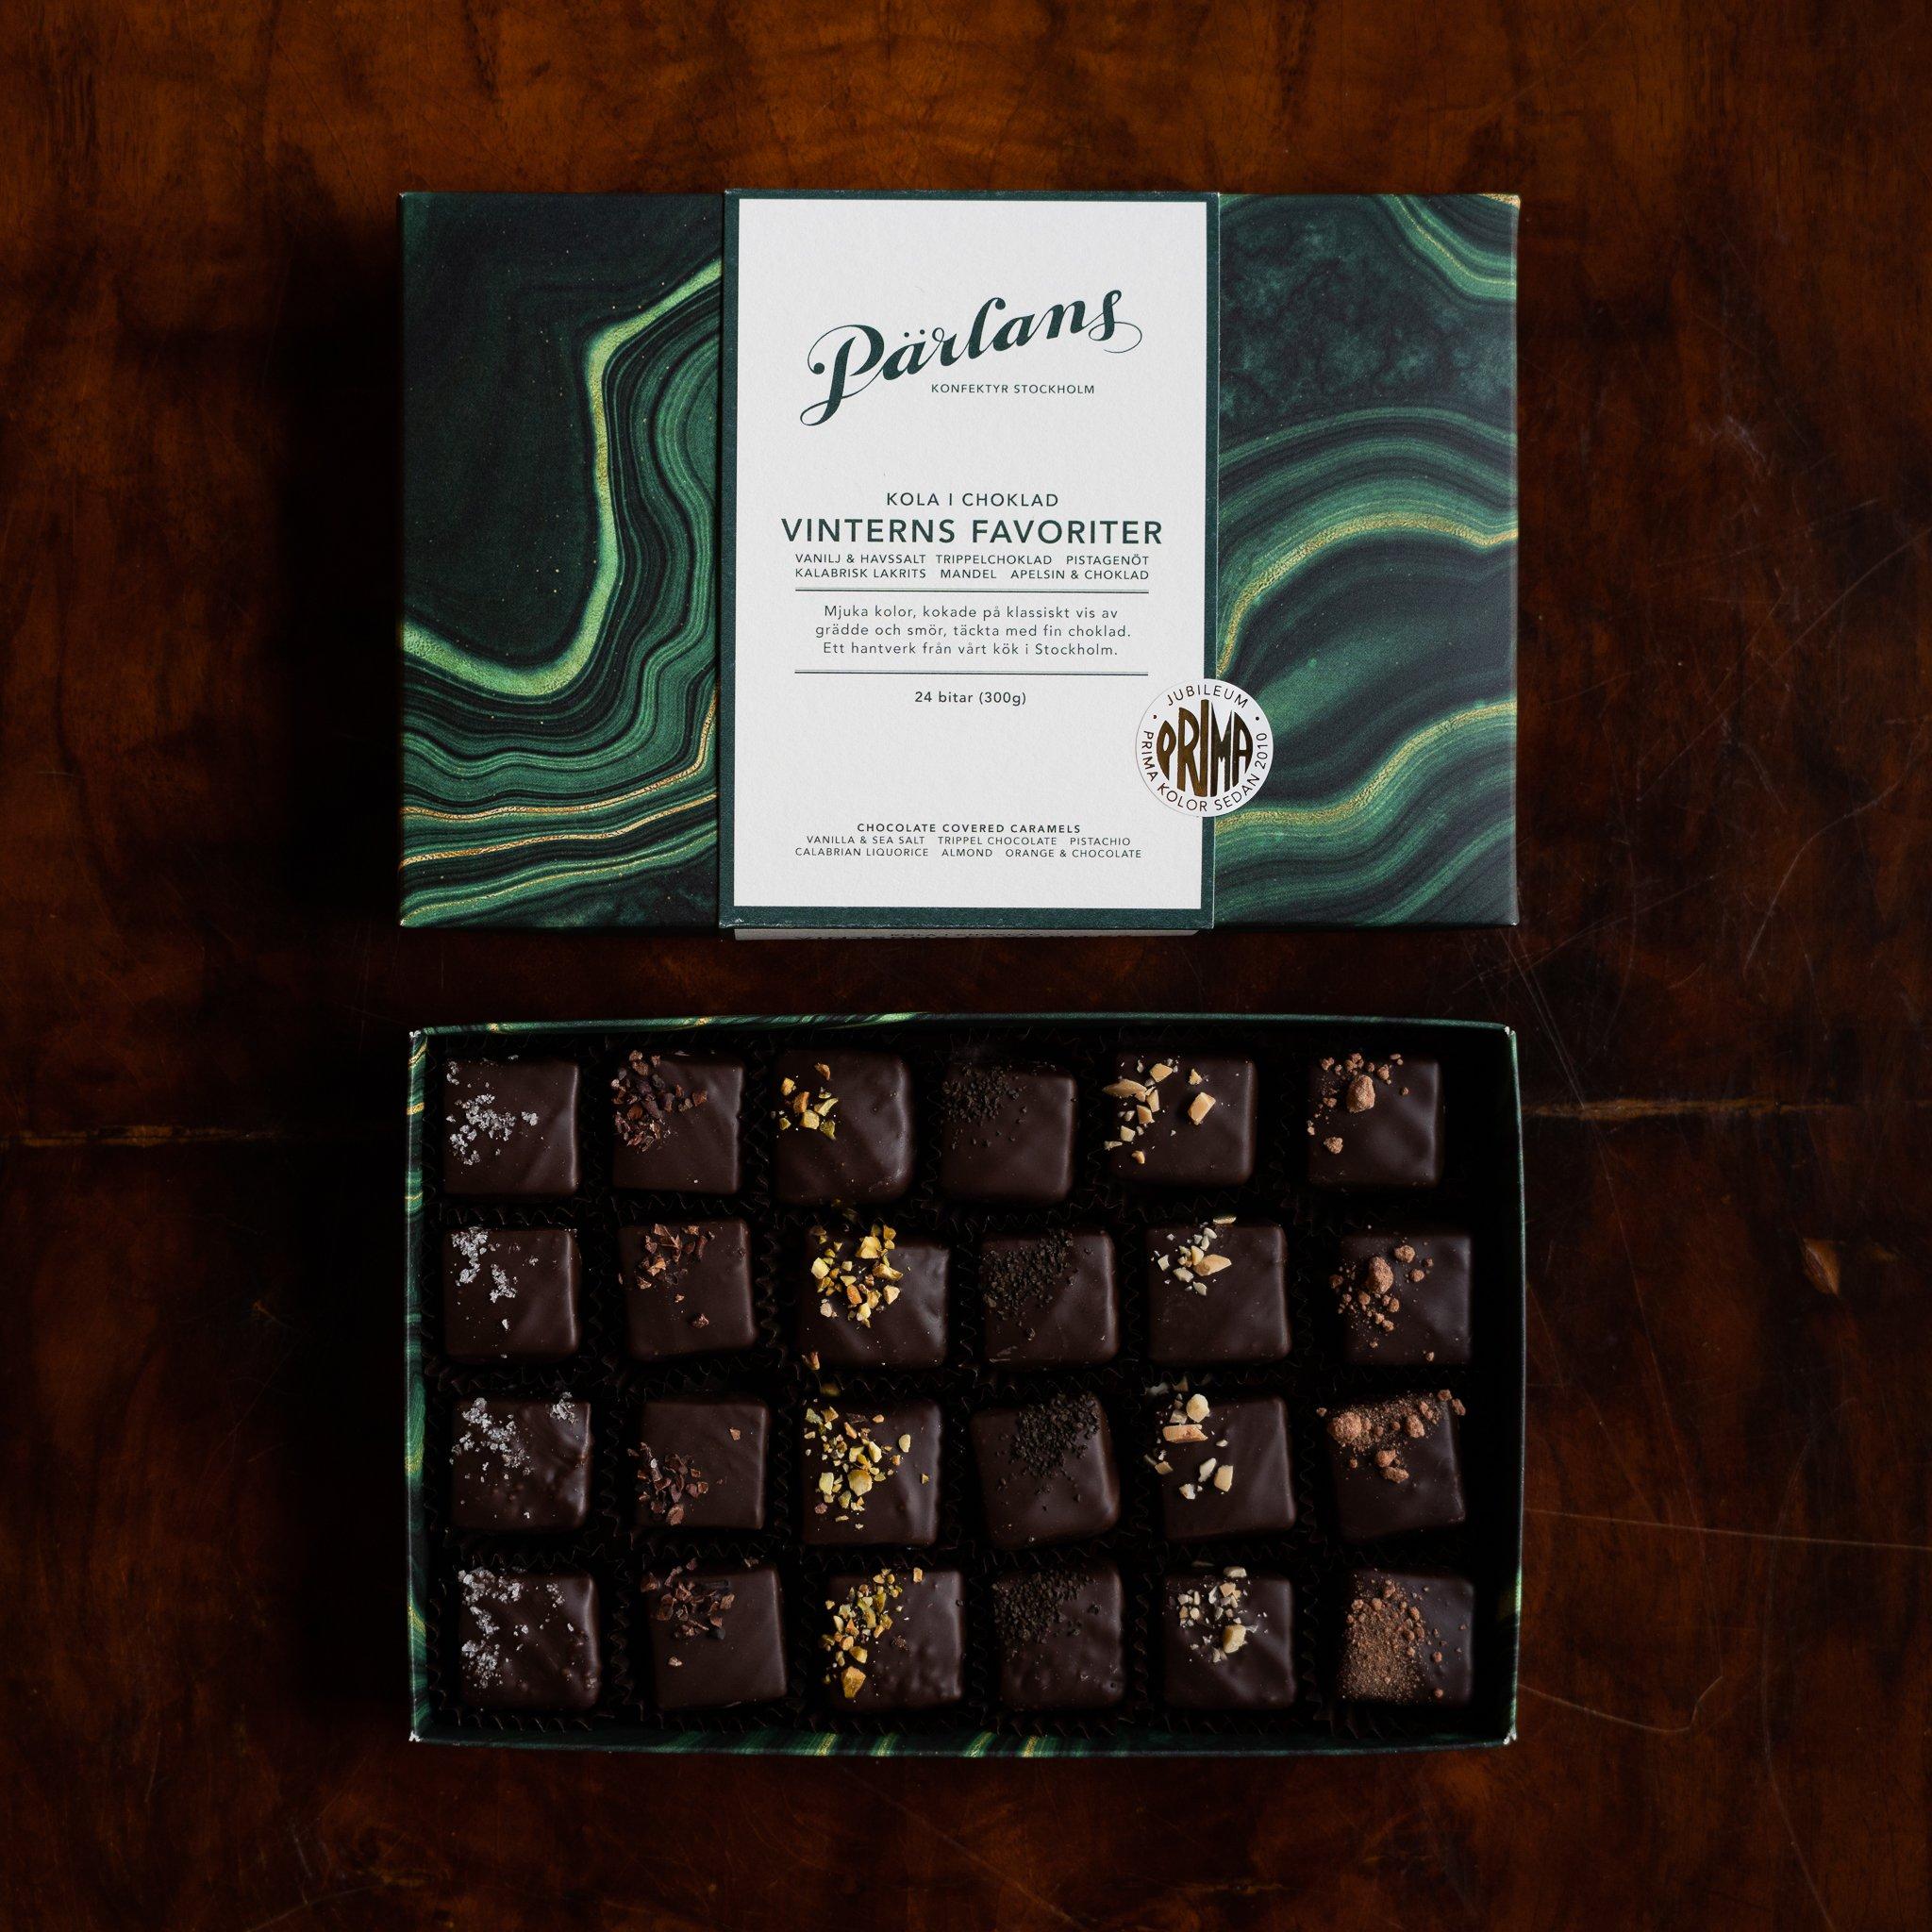 Pärlans - Karamell i sjokolade, 24 bitar